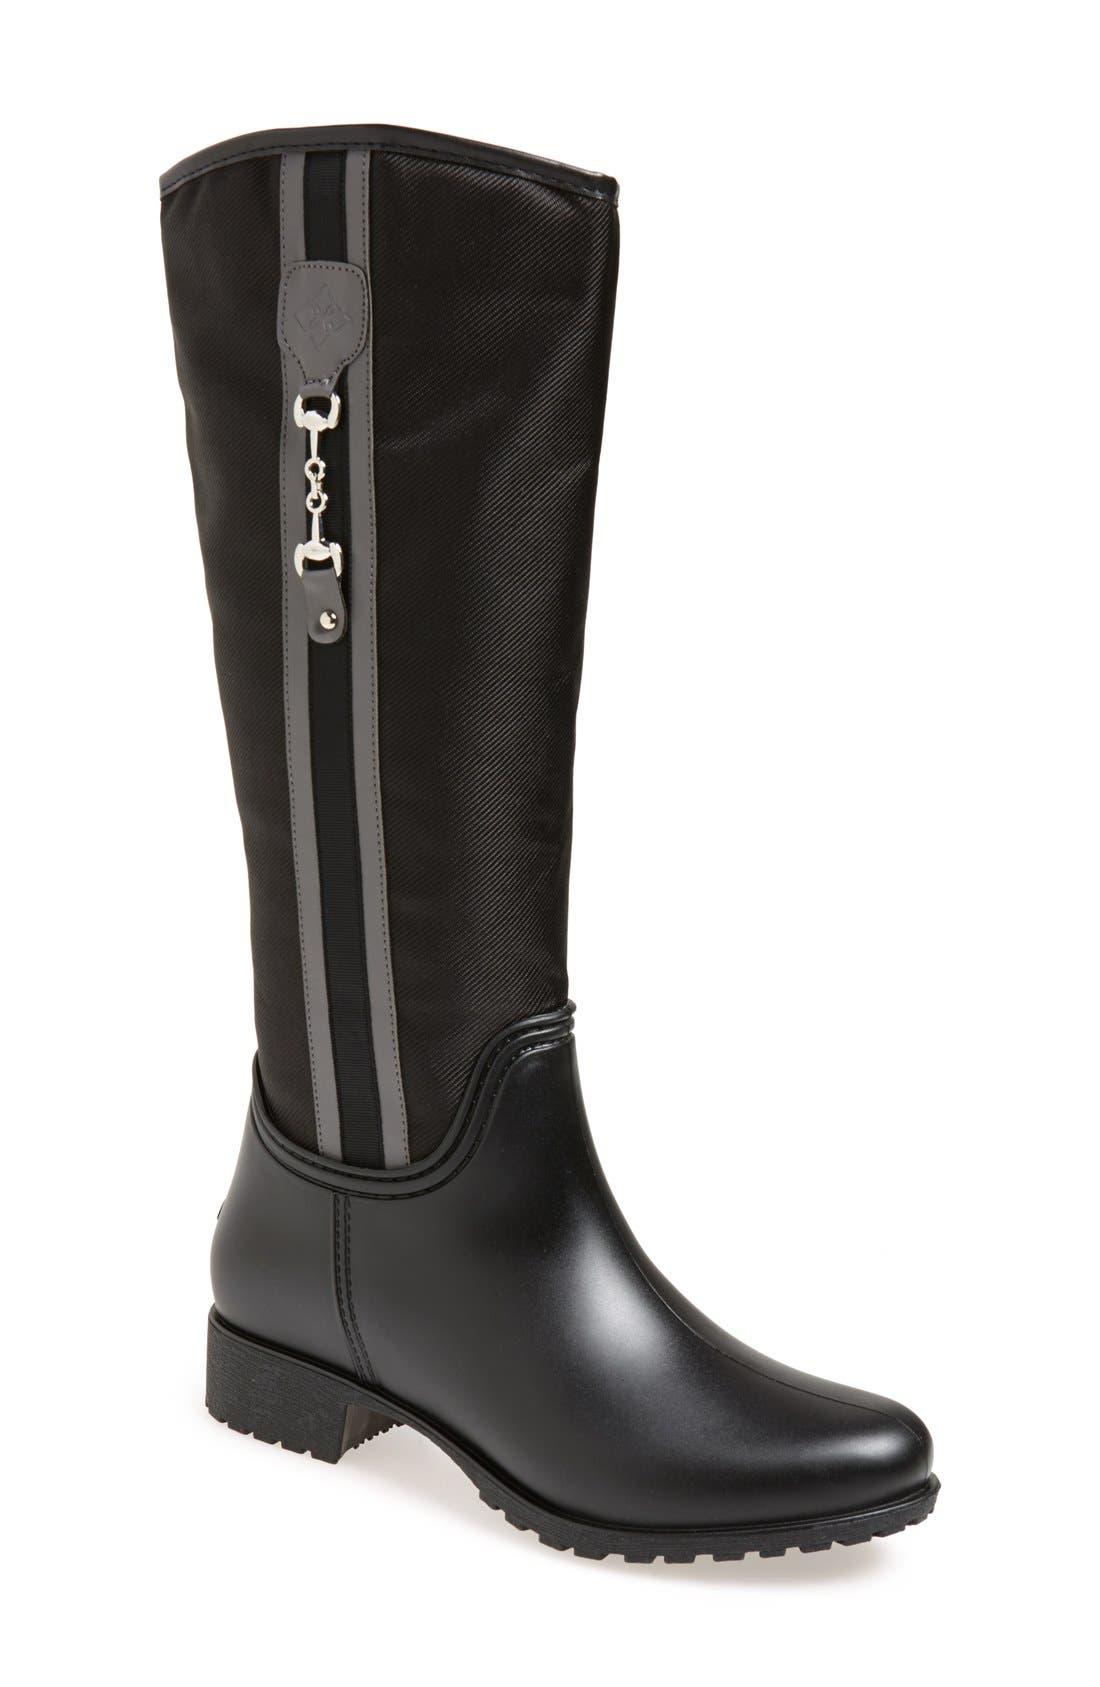 'Fairfield' Tall Rain Boot,                             Main thumbnail 1, color,                             006